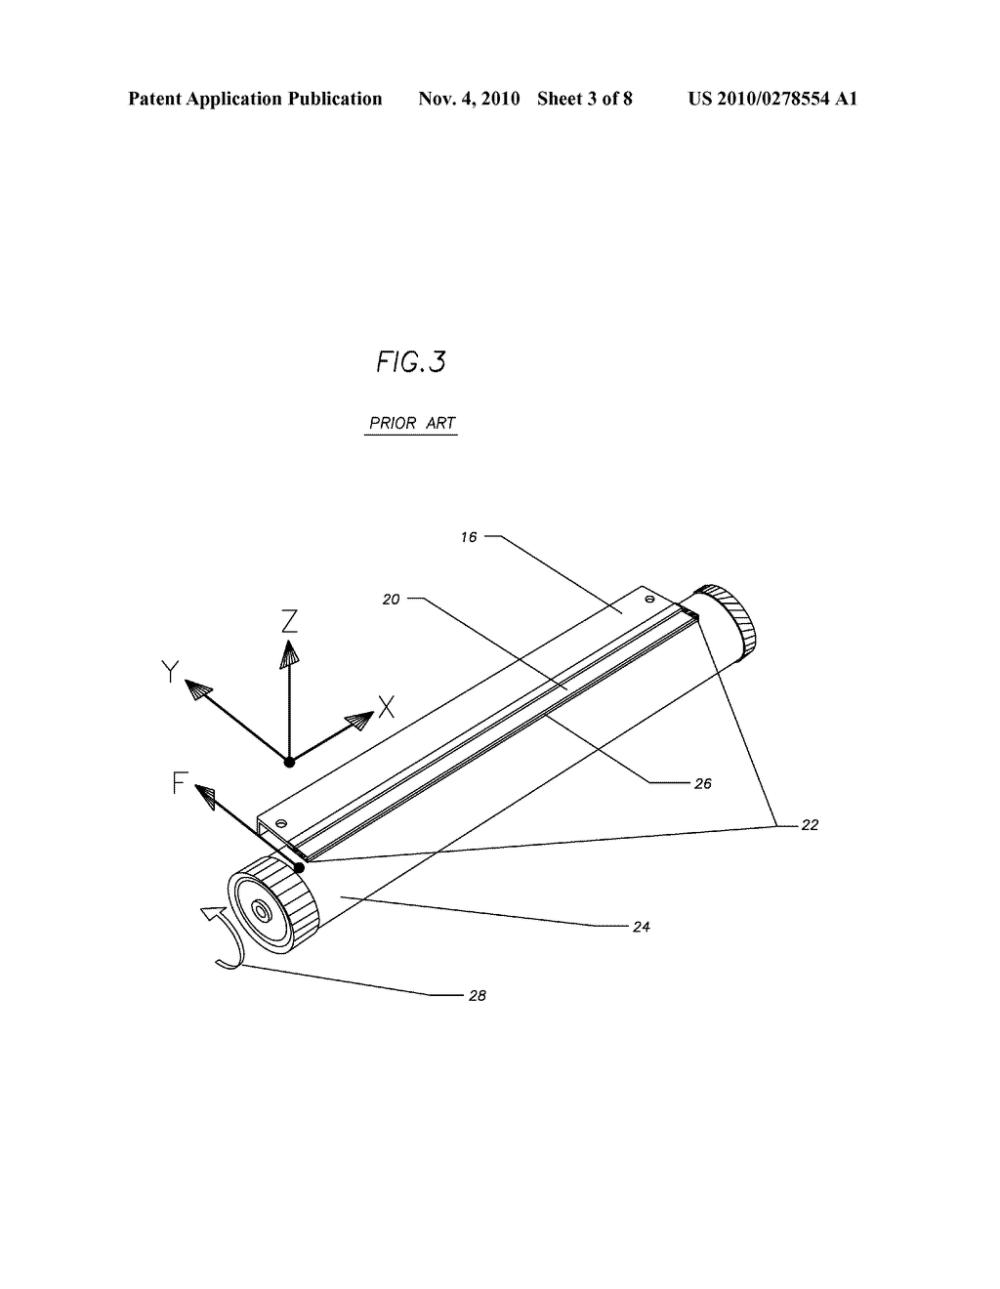 medium resolution of laser printer toner cartridge cleaning blade diagram schematic and image 04